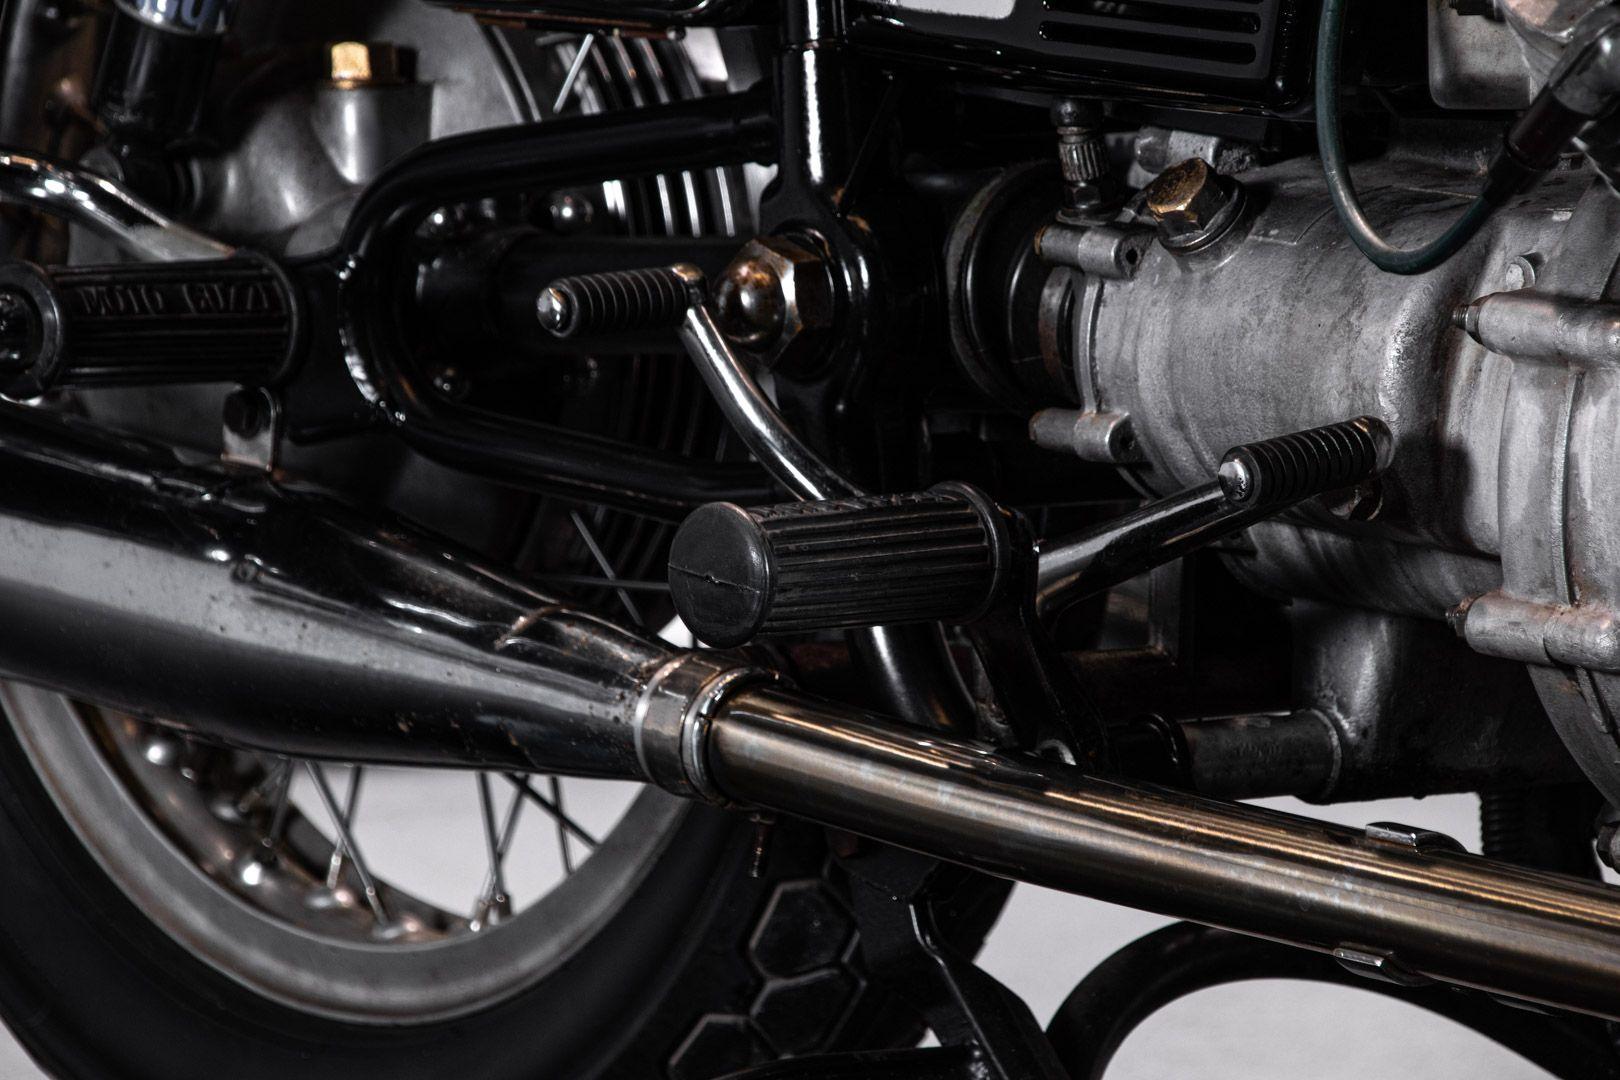 1969 Moto Guzzi V7 Special 81480